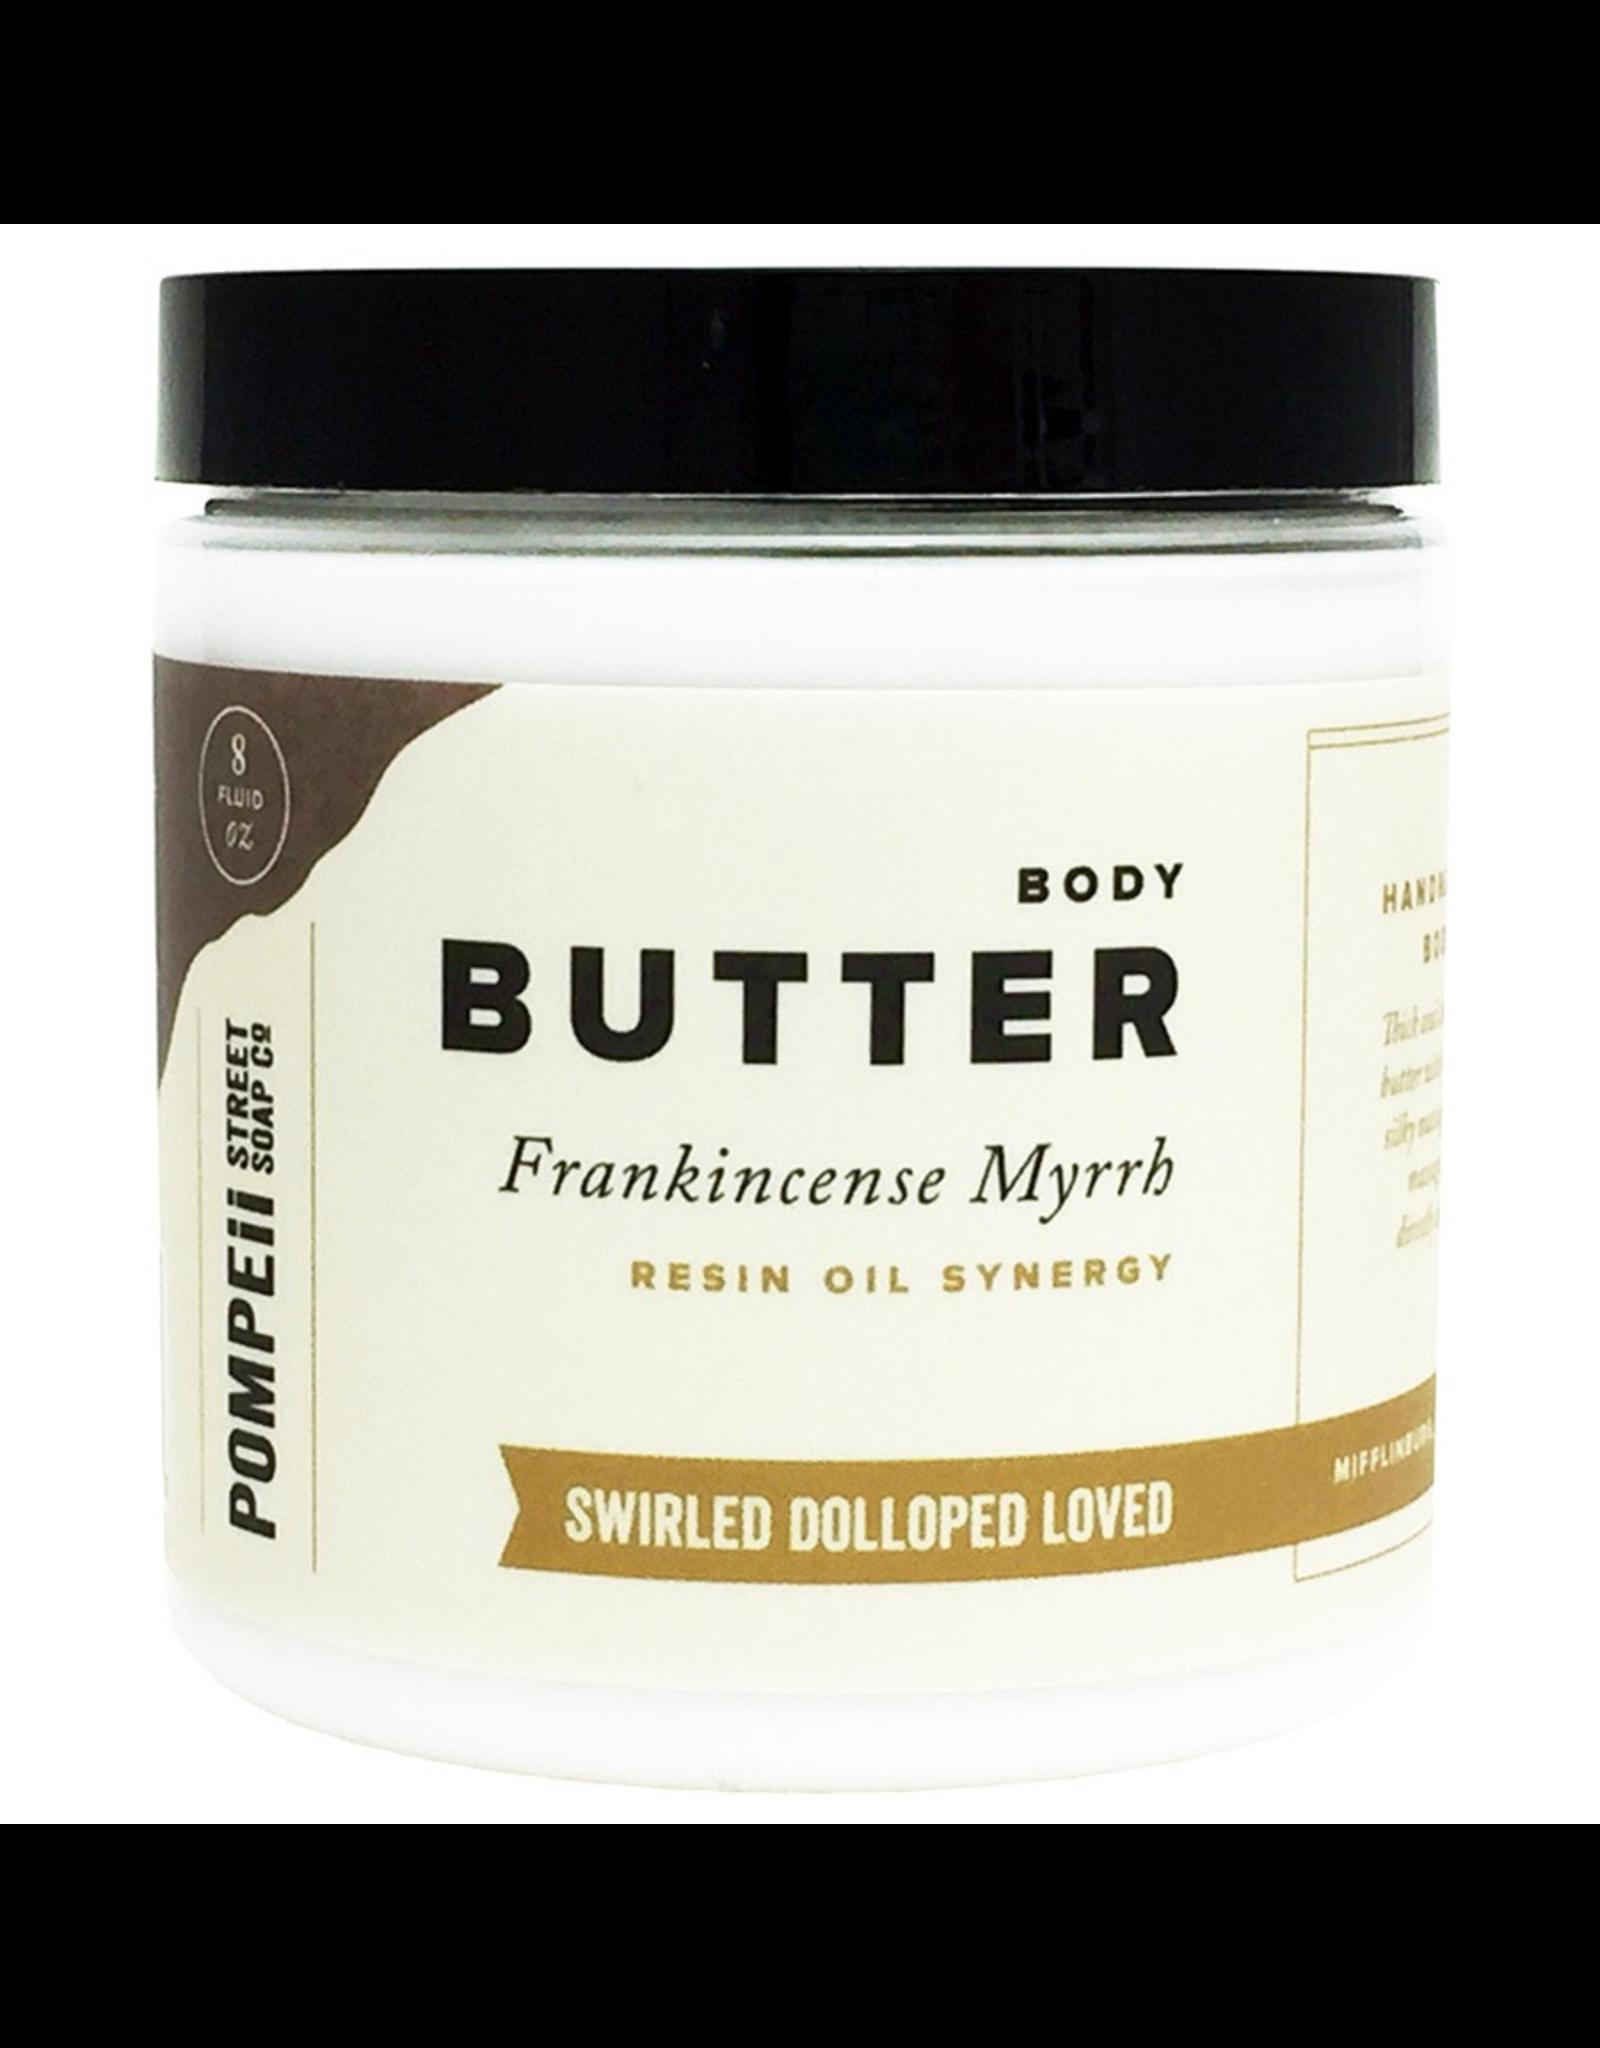 Frankincense & Myrrh Body Butter